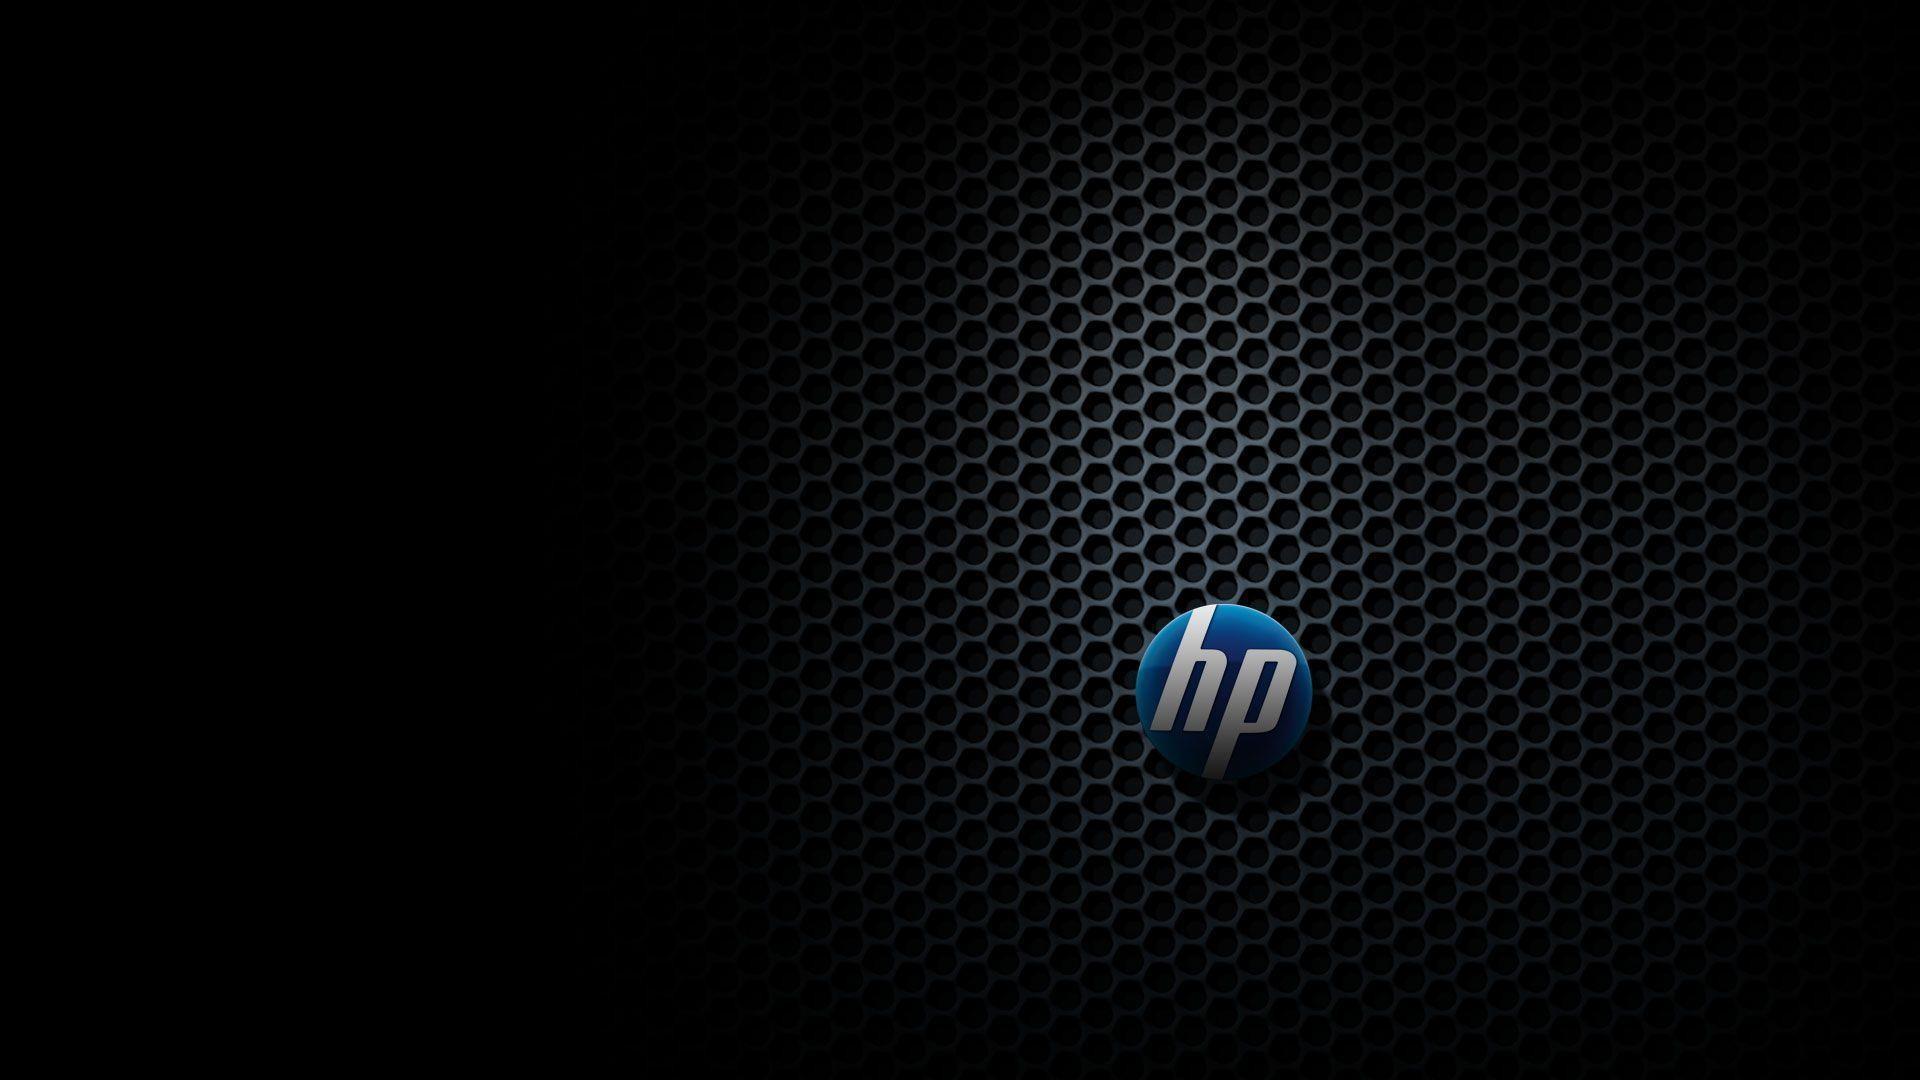 Hp Desktop Backgrounds Wallpapertag